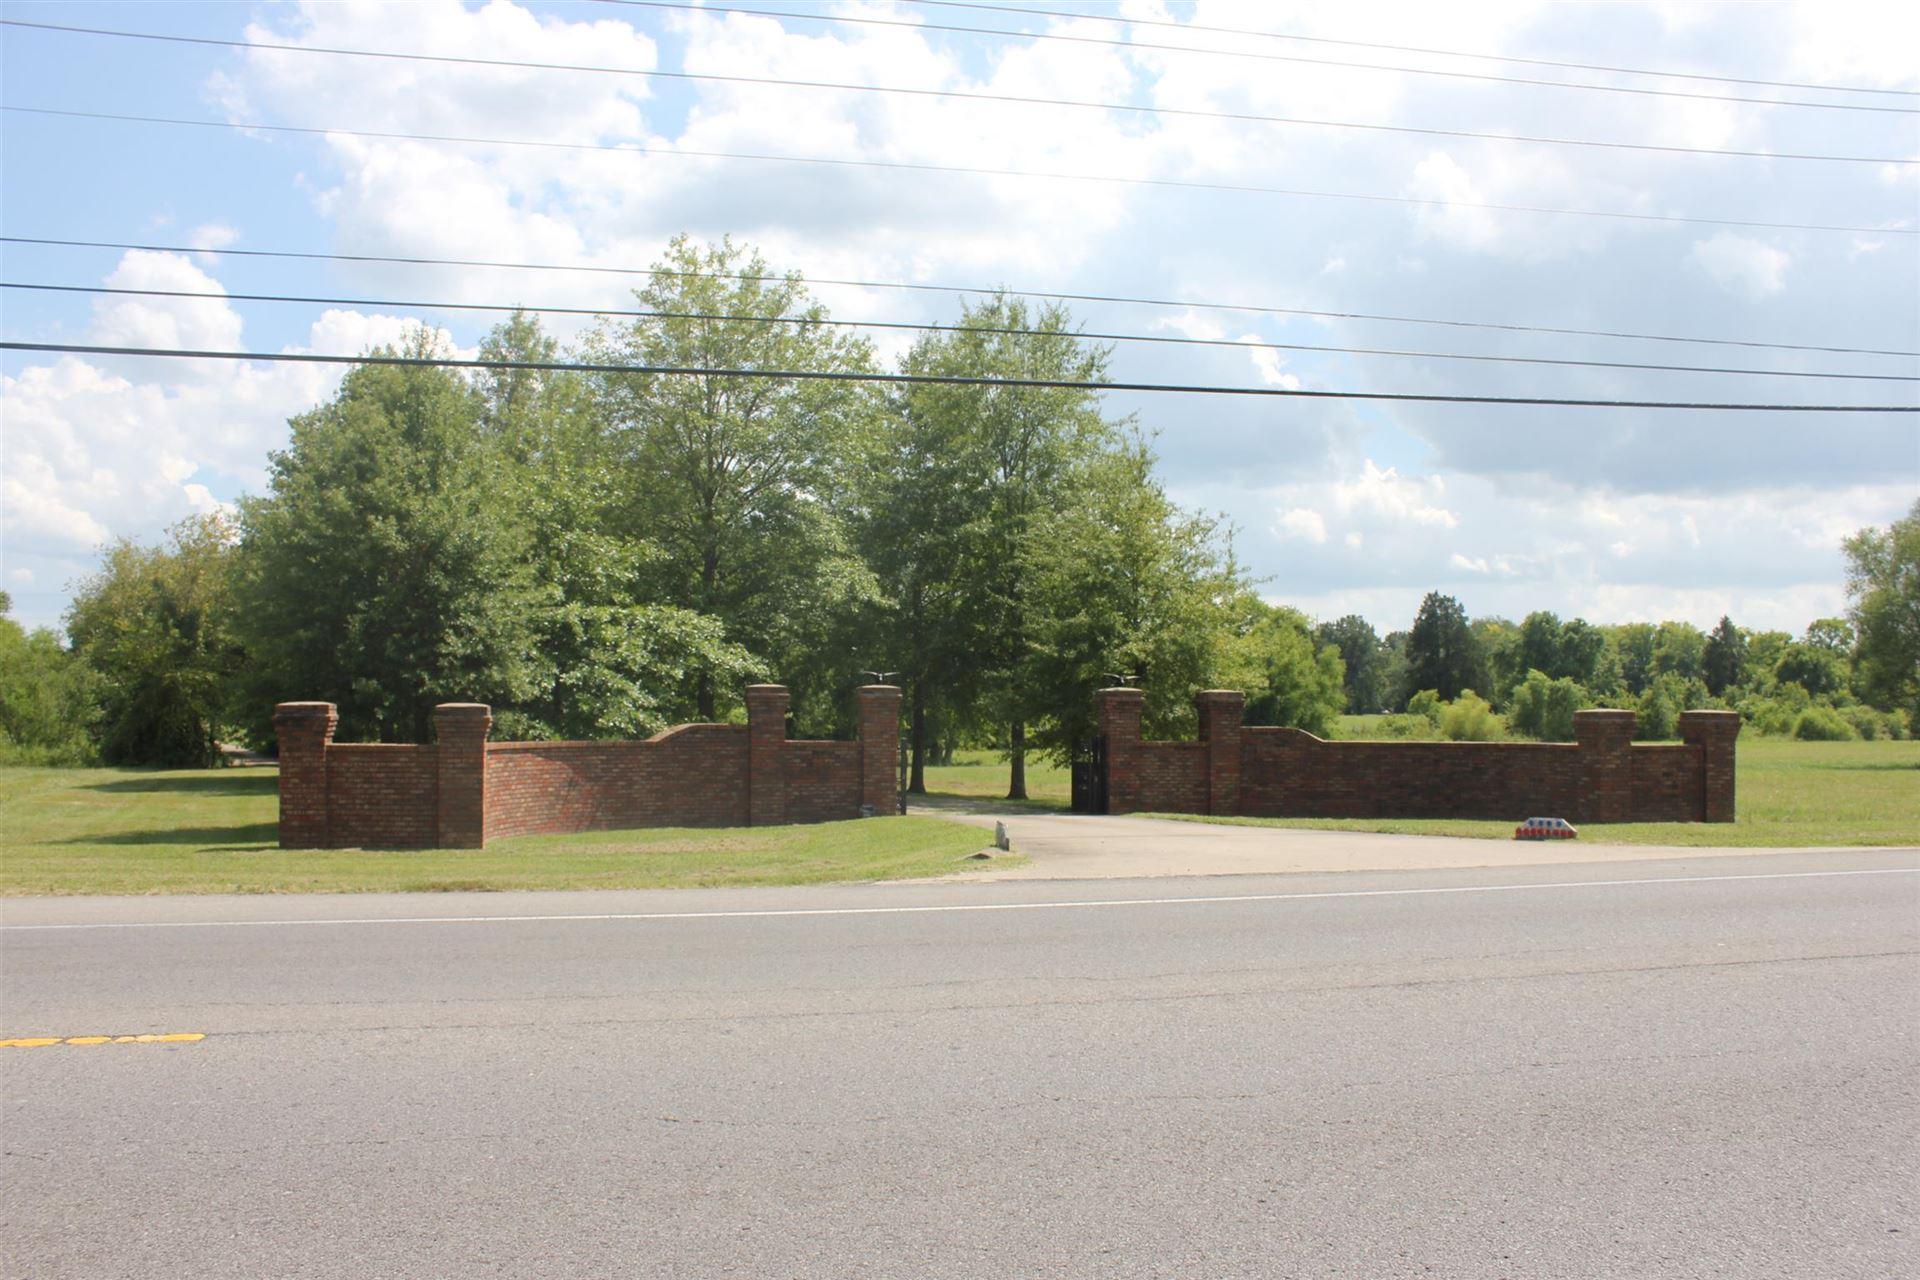 Photo of 2329 New Salem Hwy, Murfreesboro, TN 37128 (MLS # 1899551)